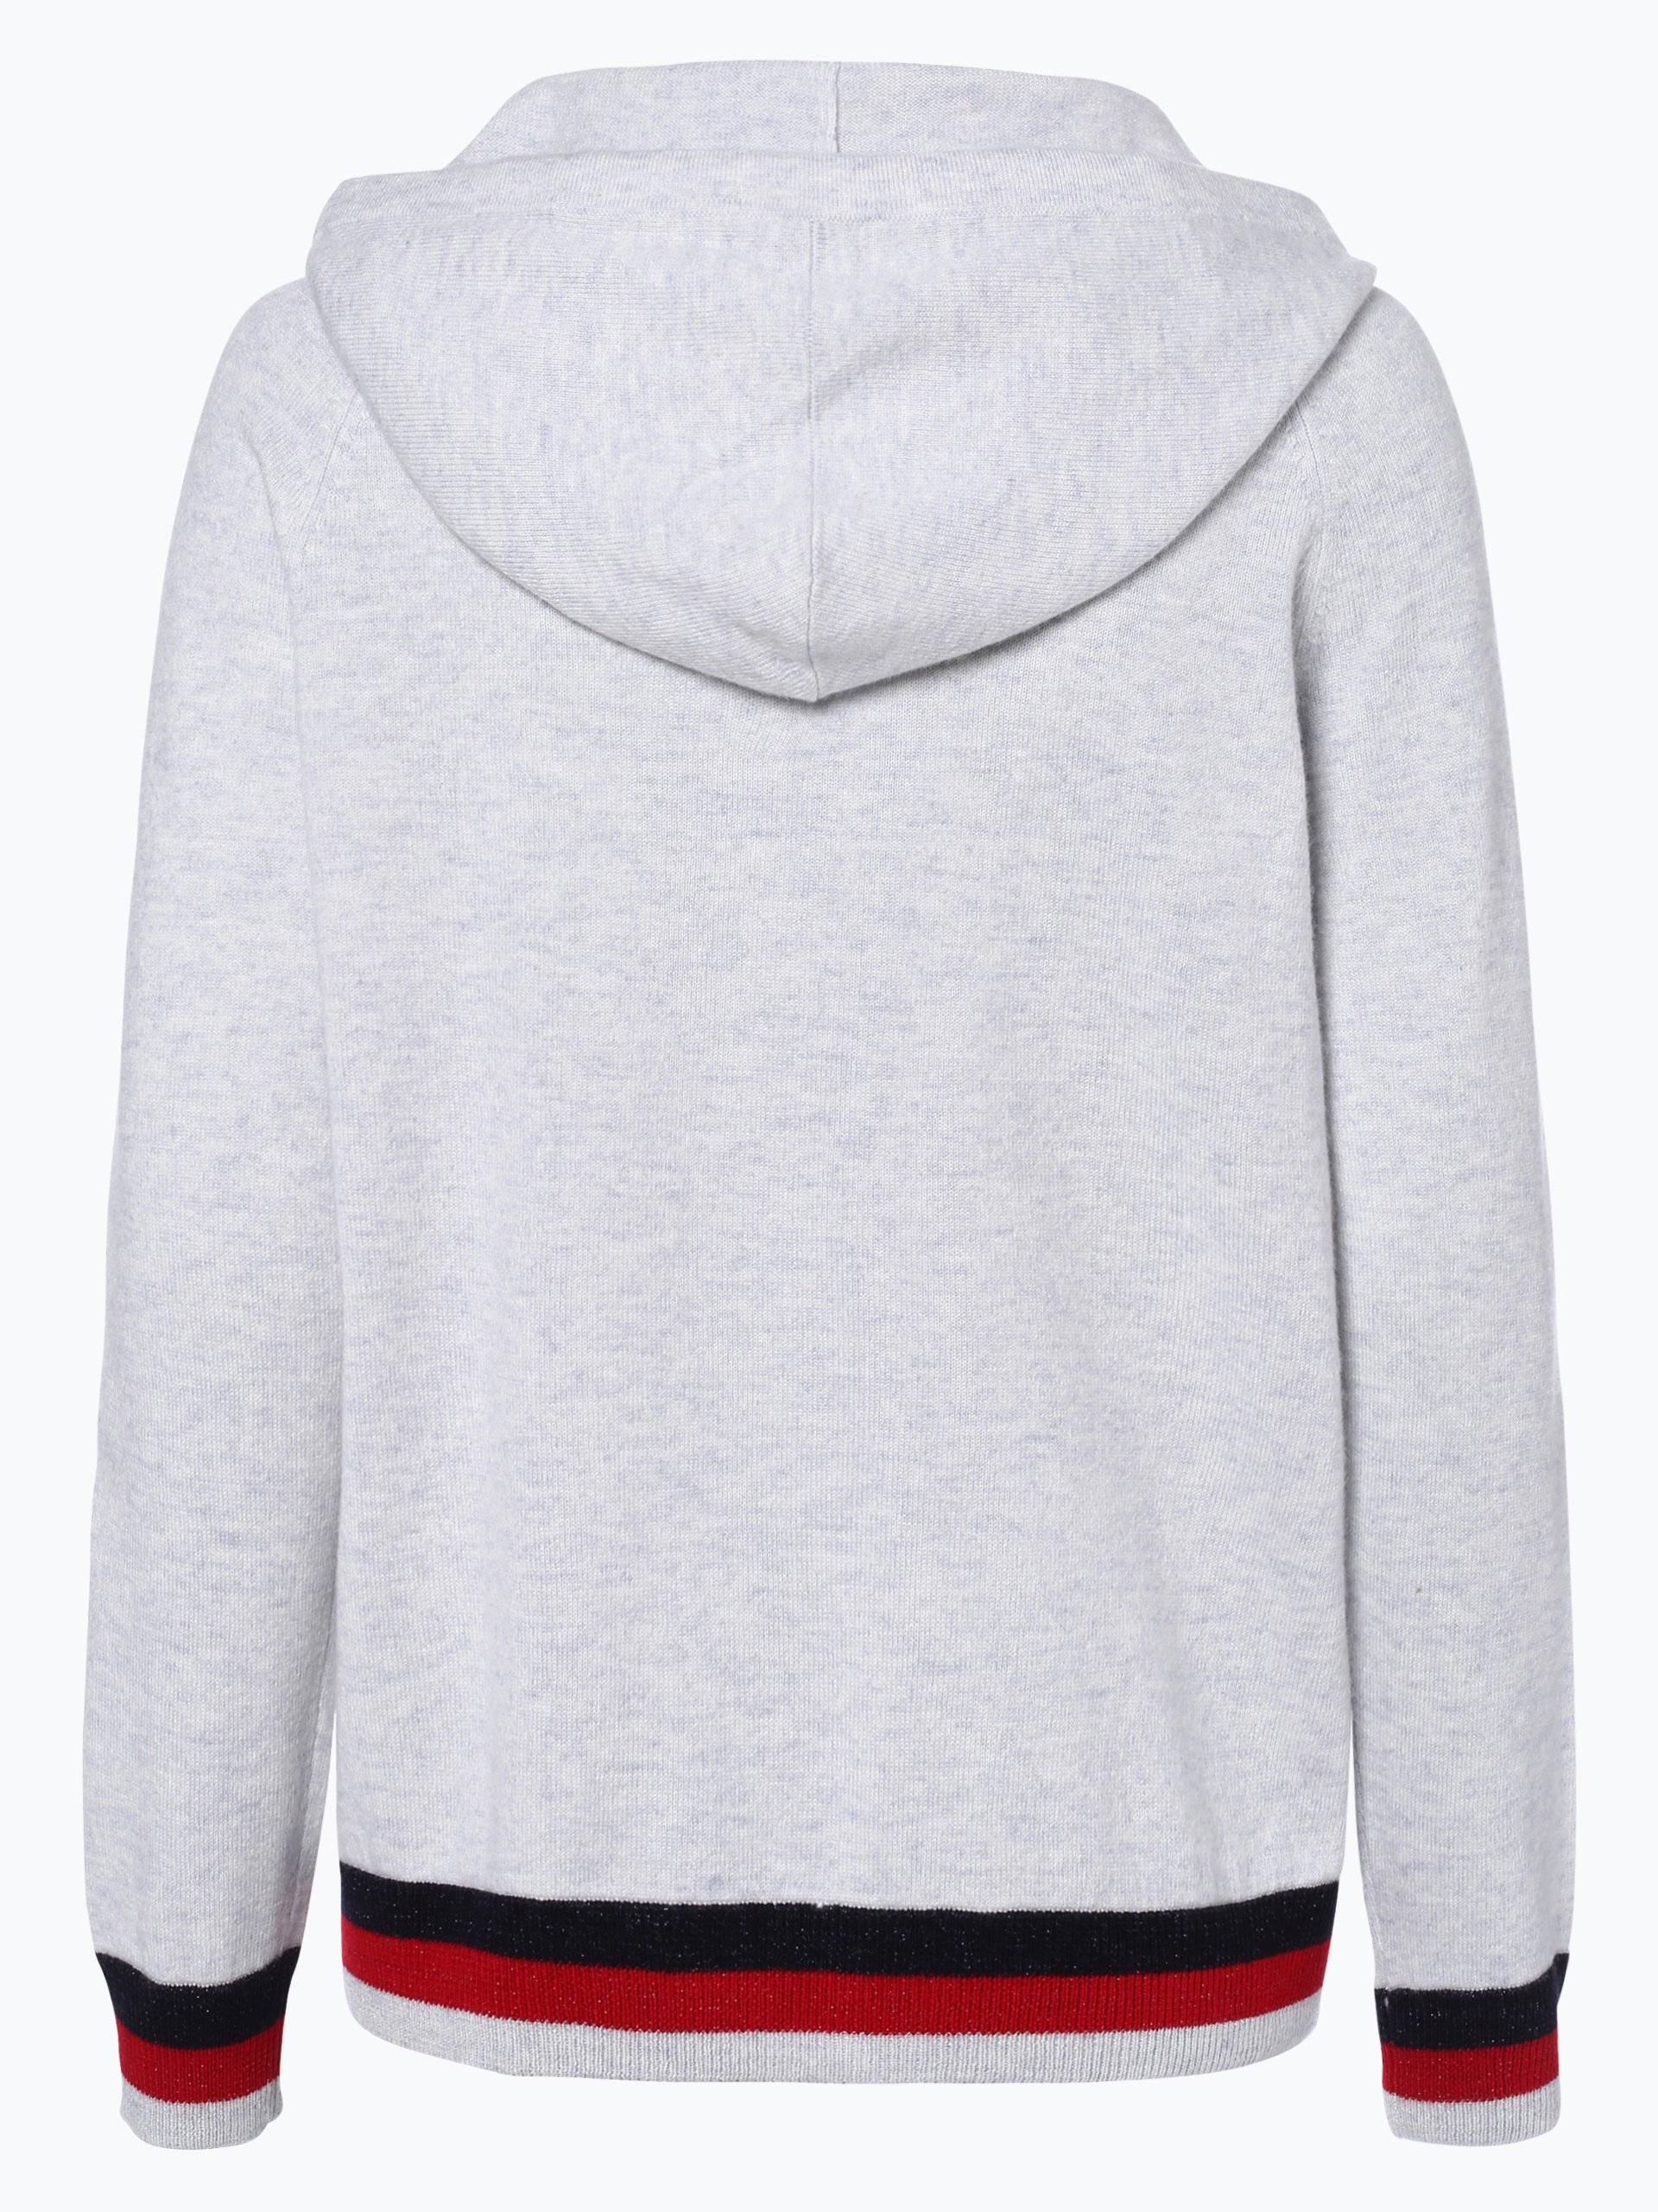 SvB Exquisit Sweter damski z dodatkiem kaszmiru